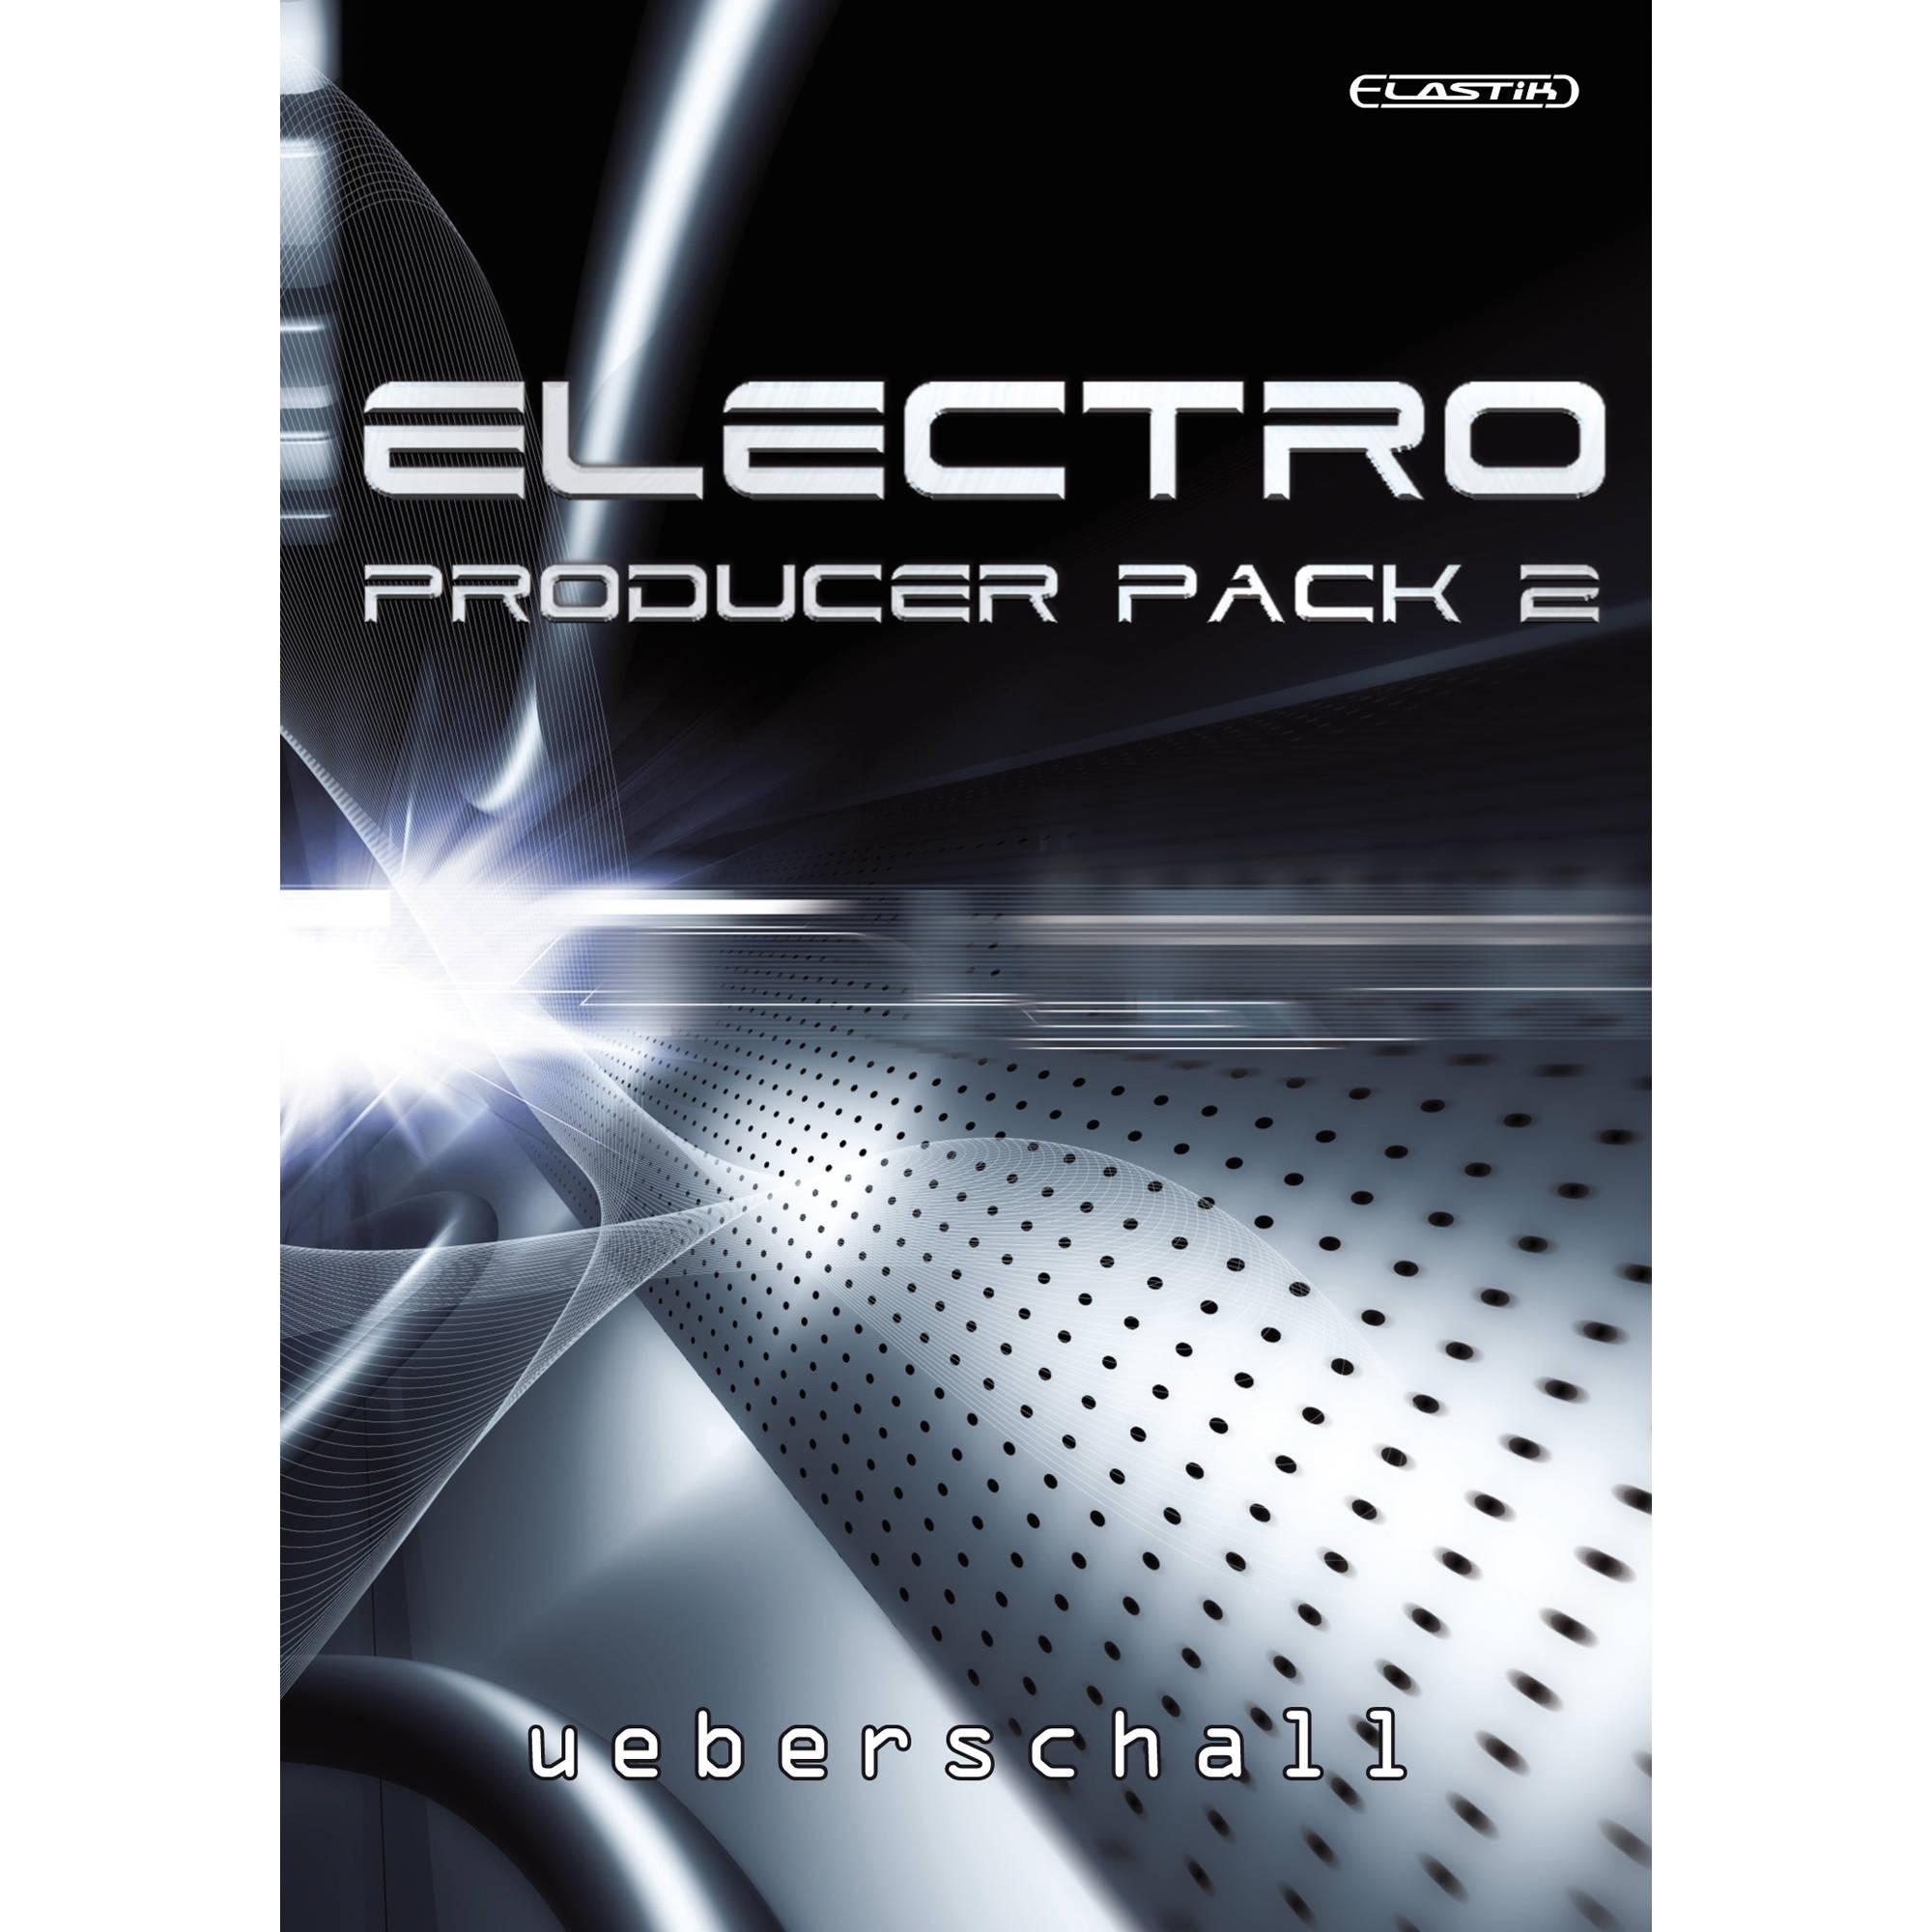 Big fish audio dvd electro producer pack 2 elpp2 pw b h photo for Big fish audio